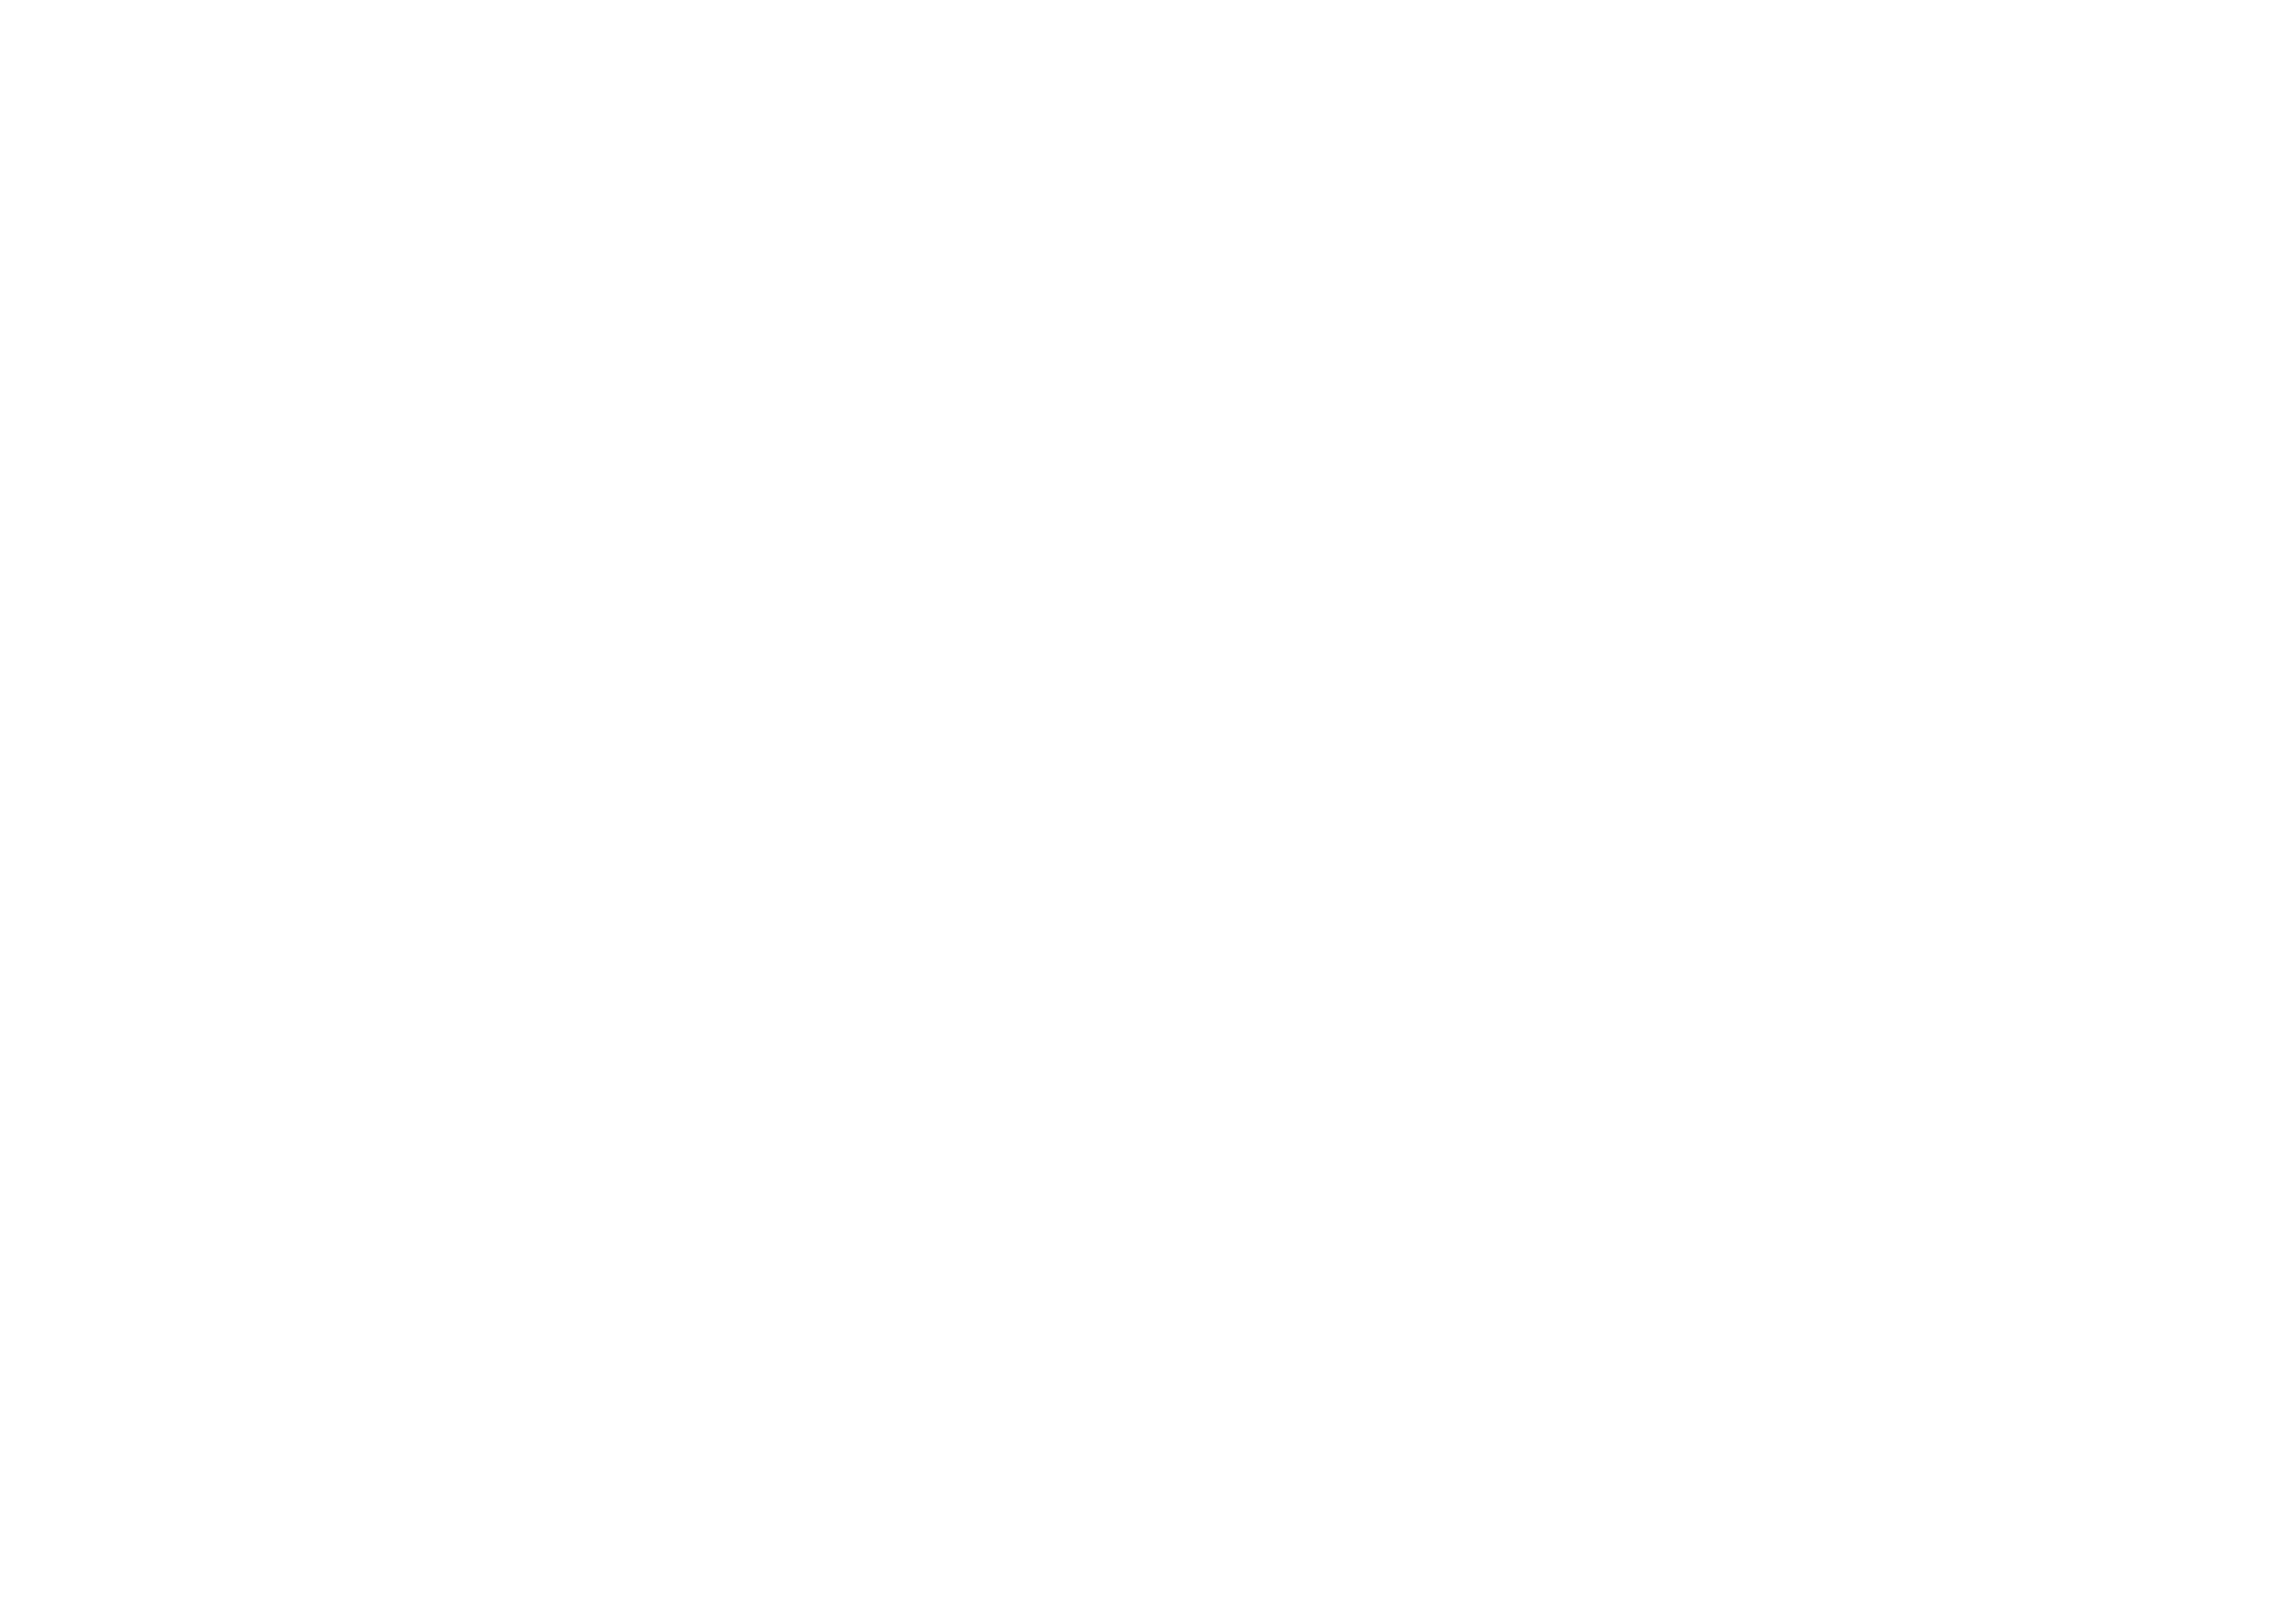 tigerFish tools logo